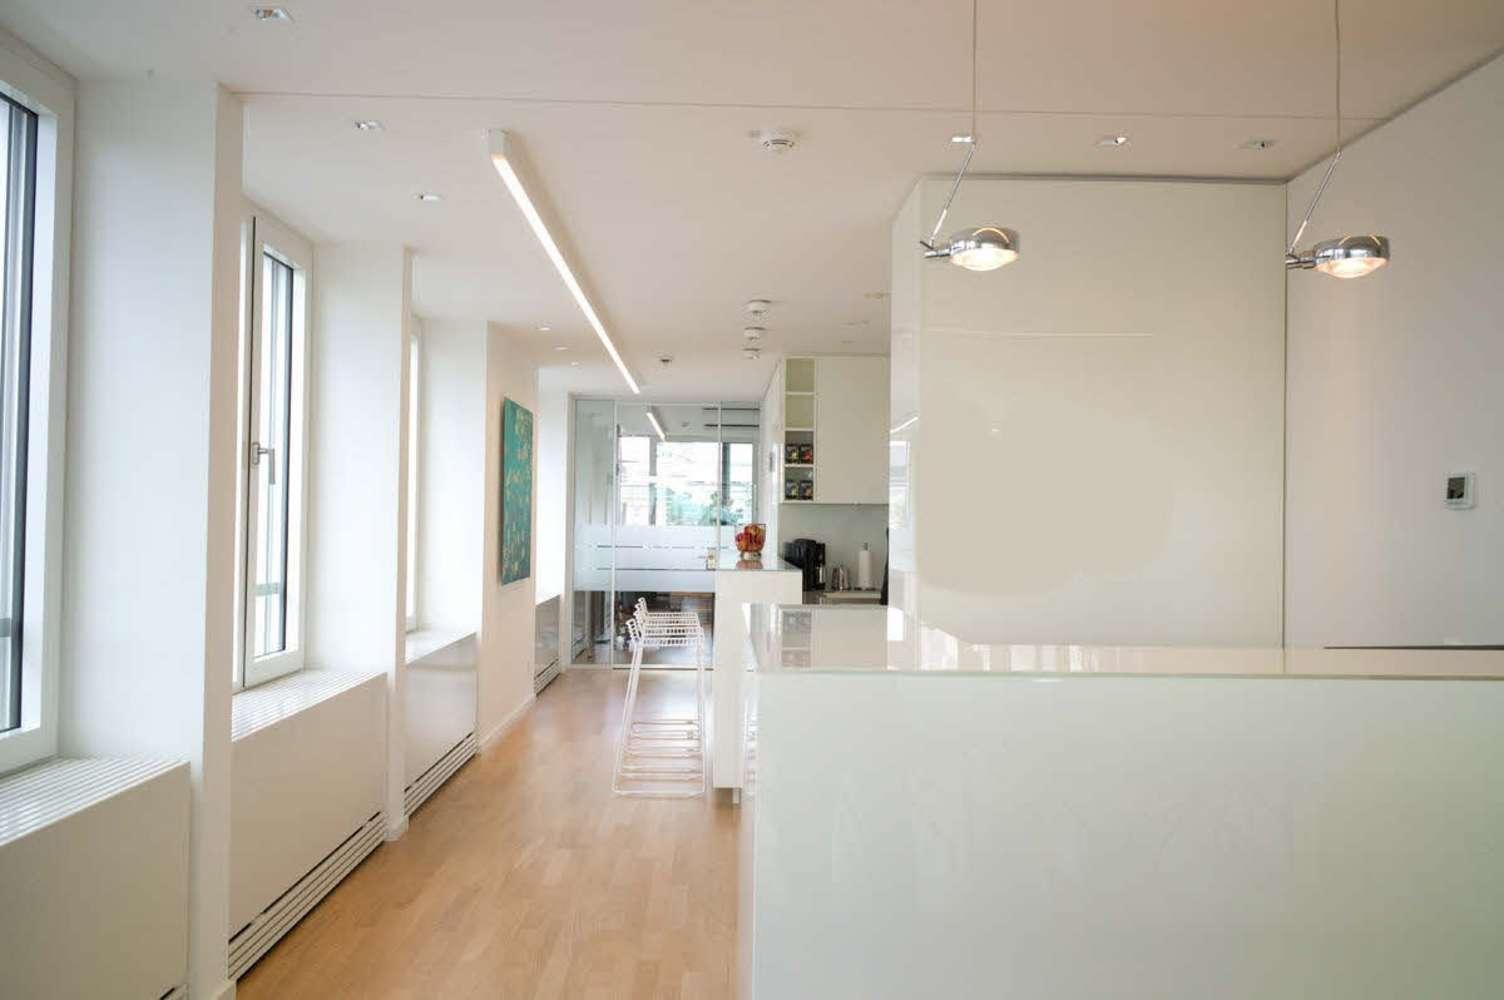 Büros Hamburg, 20354 - Büro - Hamburg, Neustadt - H0141 - 9419888